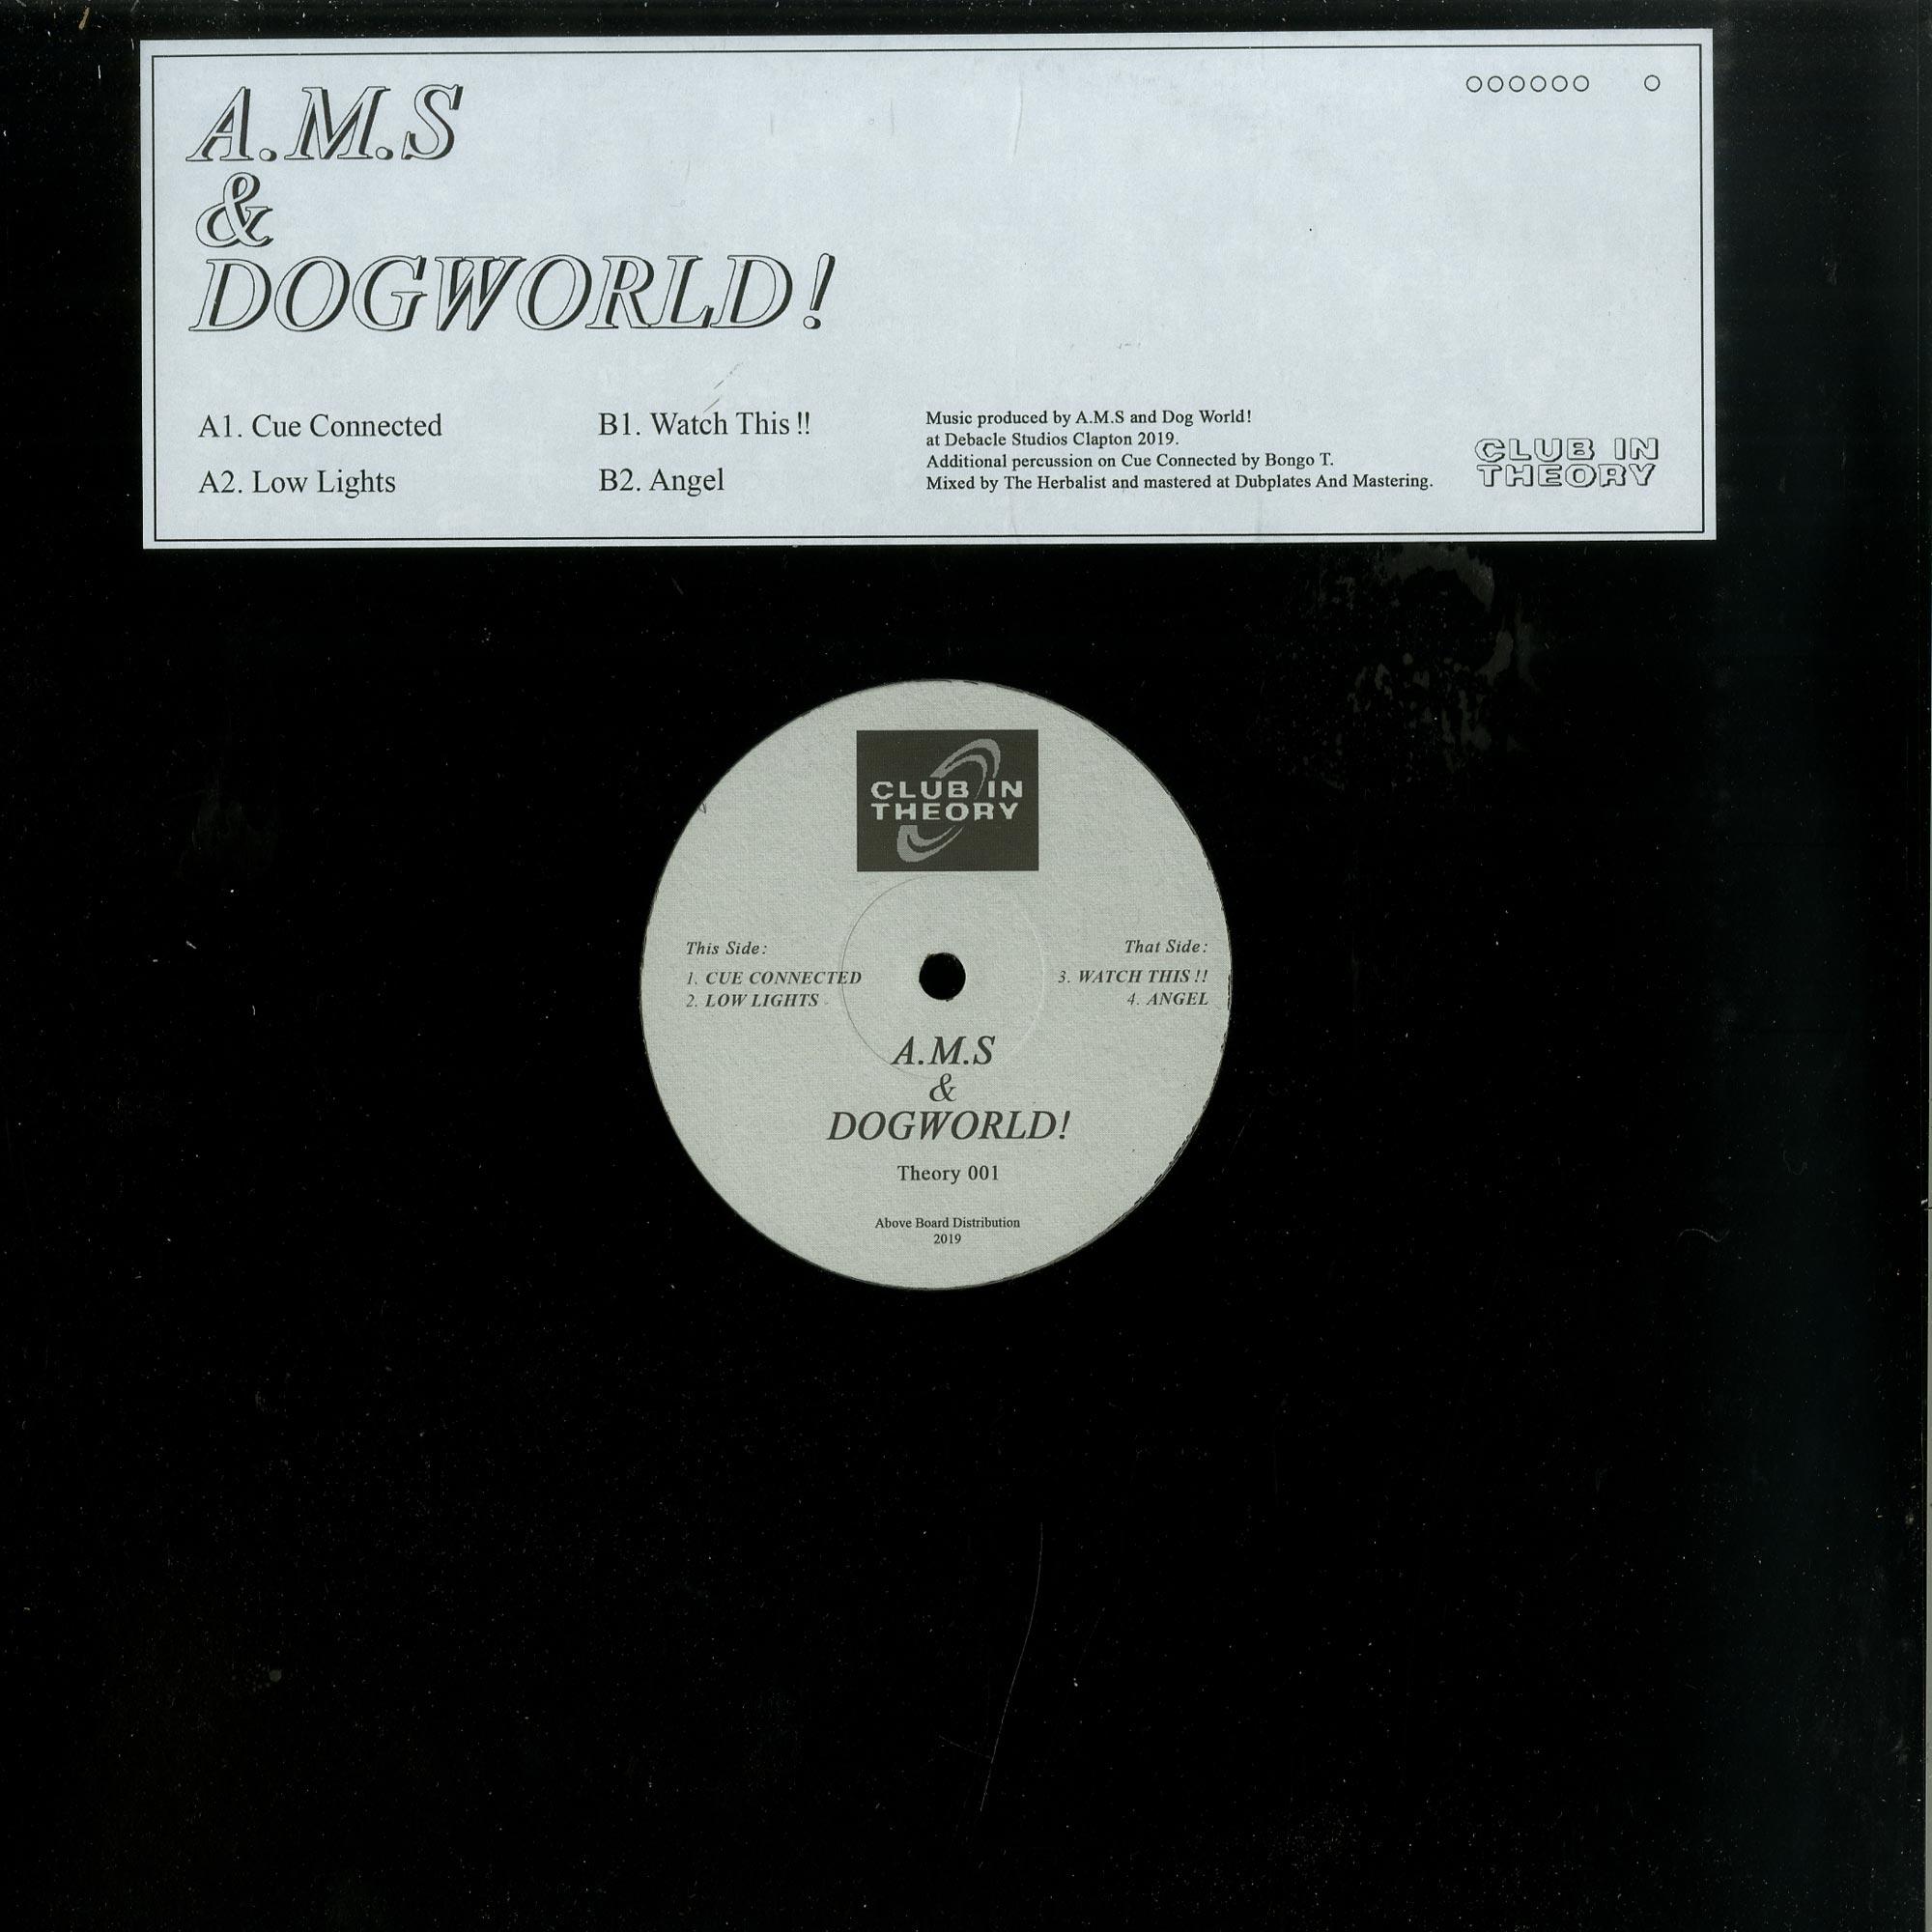 A.M.S & Dogworld! - THEORY 001